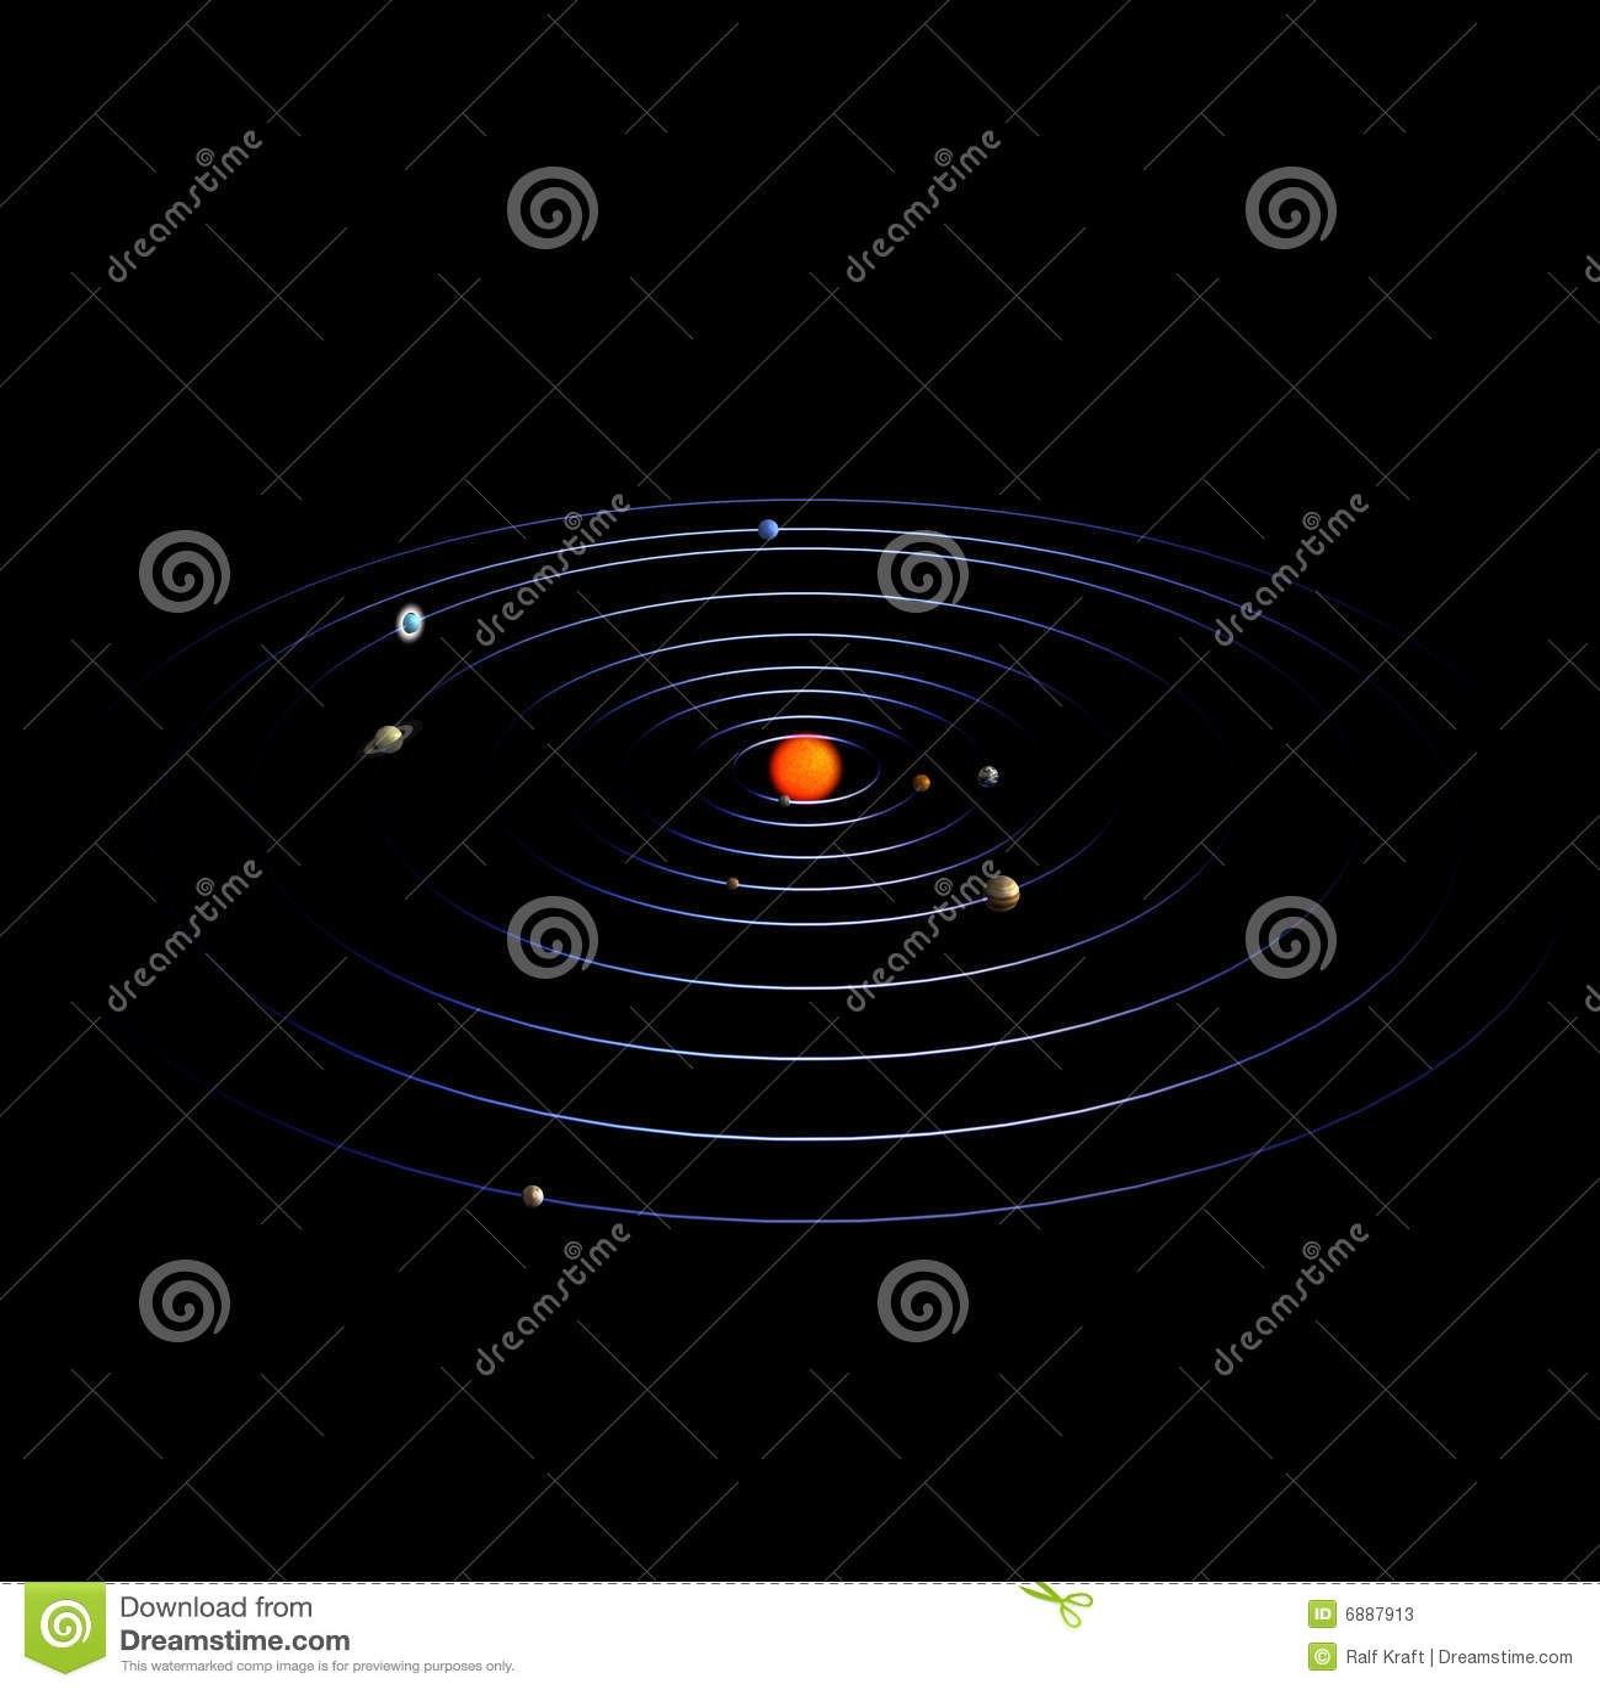 solar system paths - photo #35